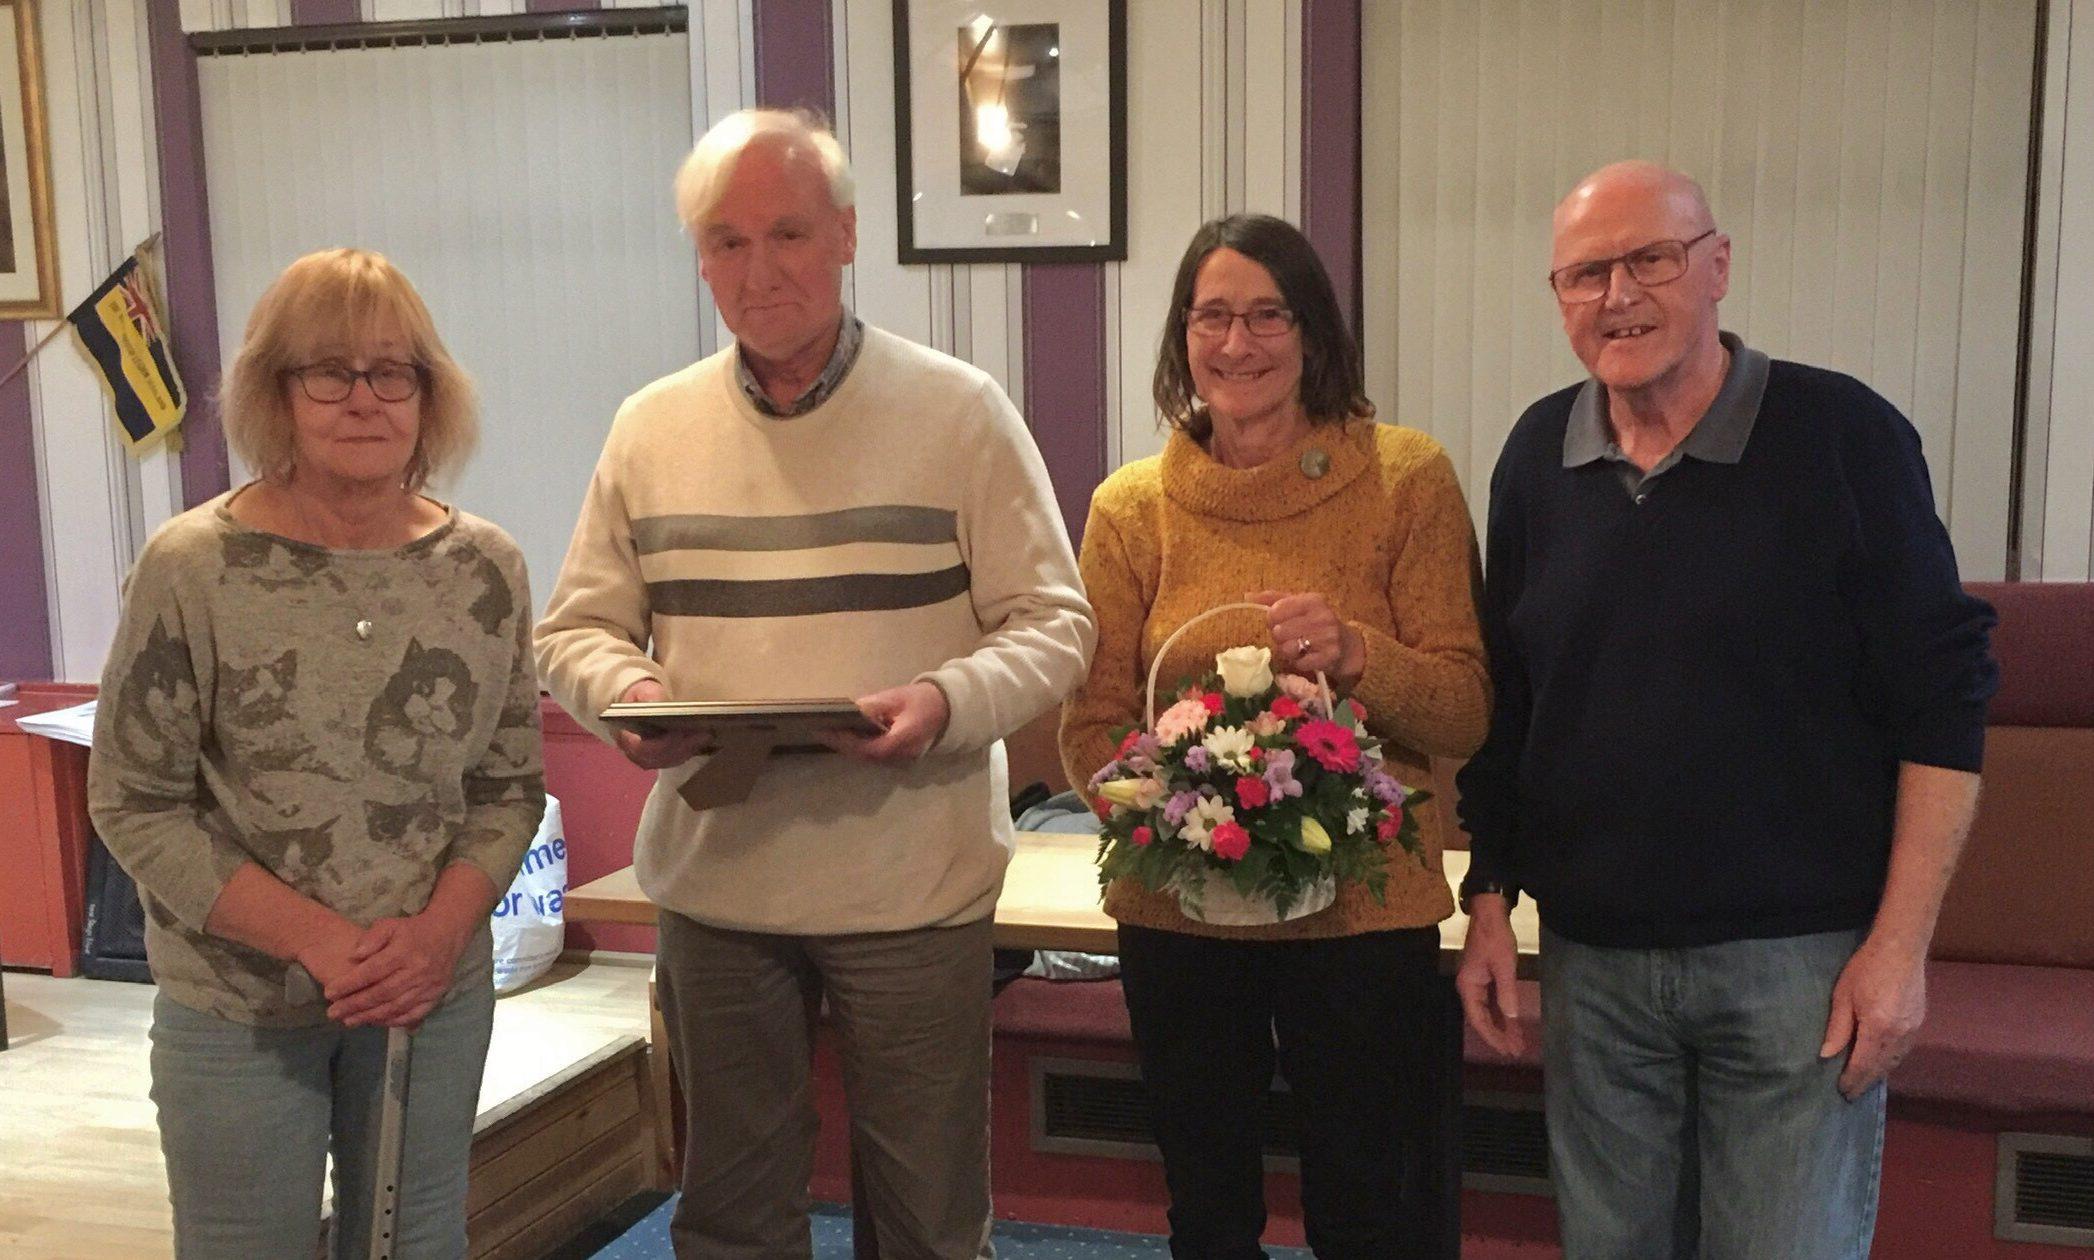 From left, Dorothy Robertson, Ian Mackay, Wilma Mackay and Brian Robson.